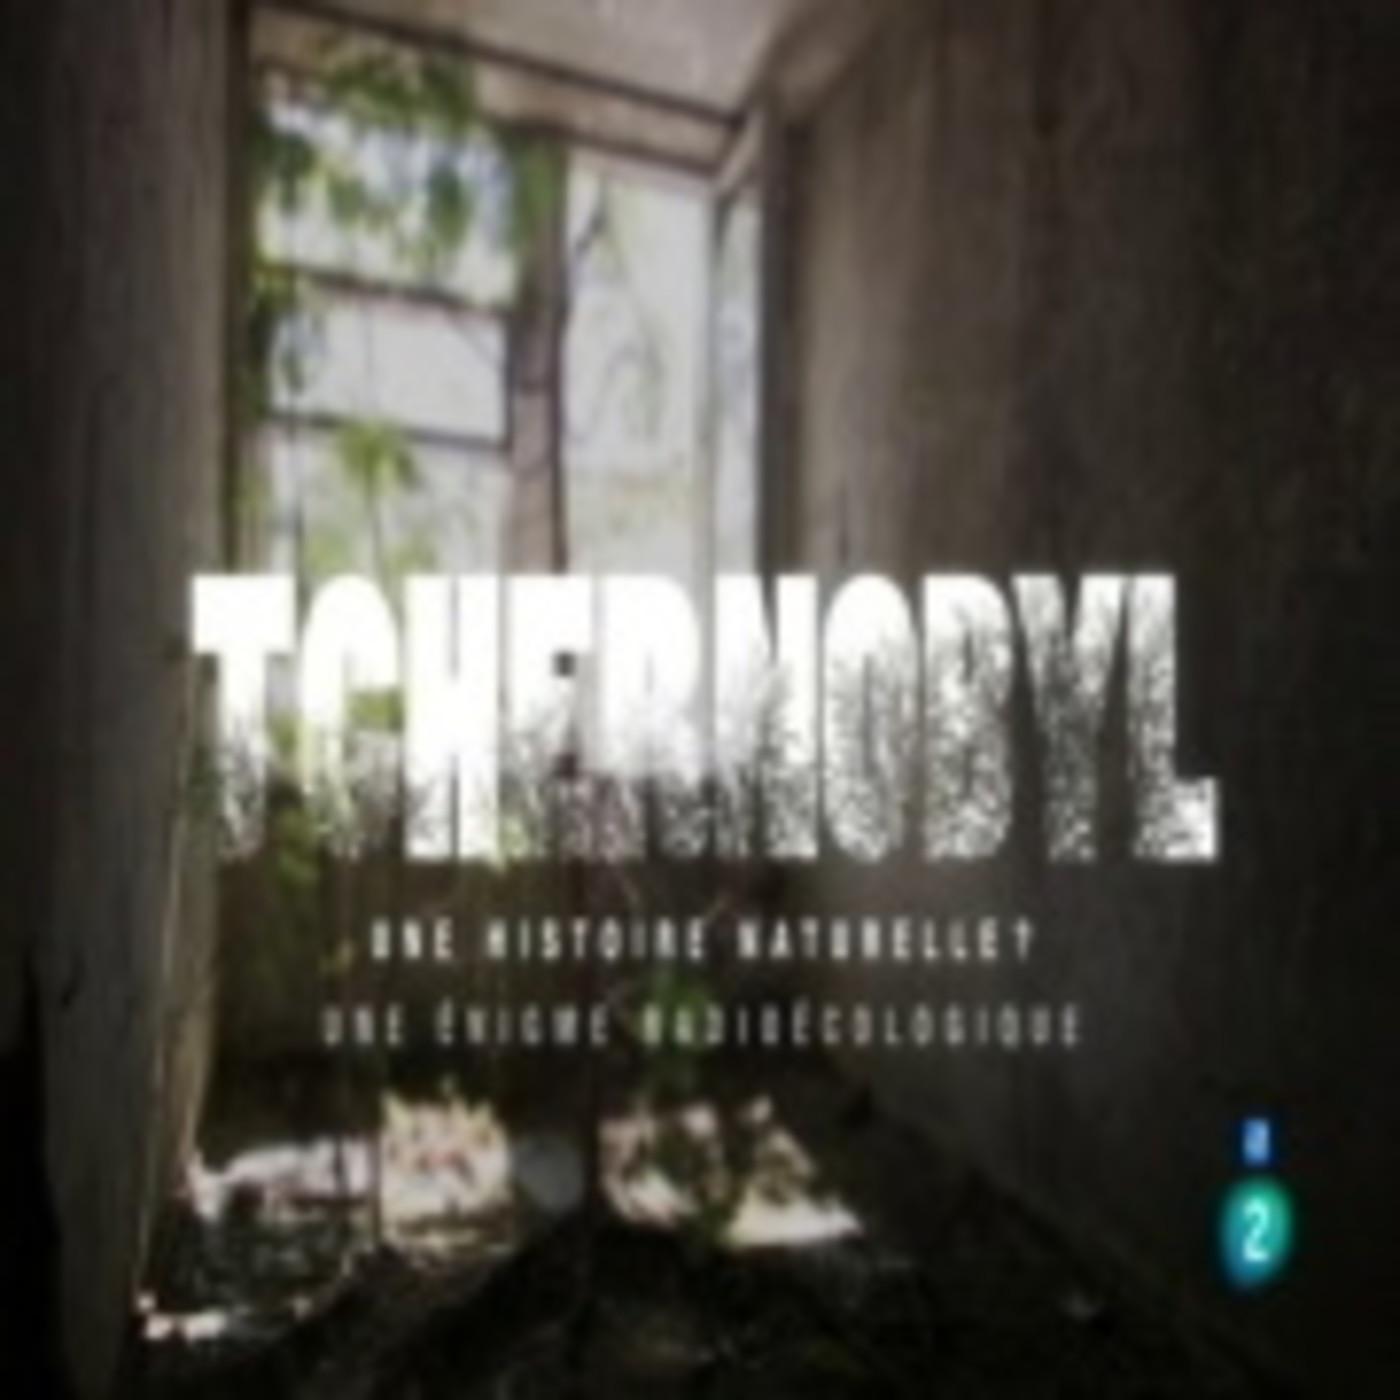 Chernobyl - Un enigma radiactivo